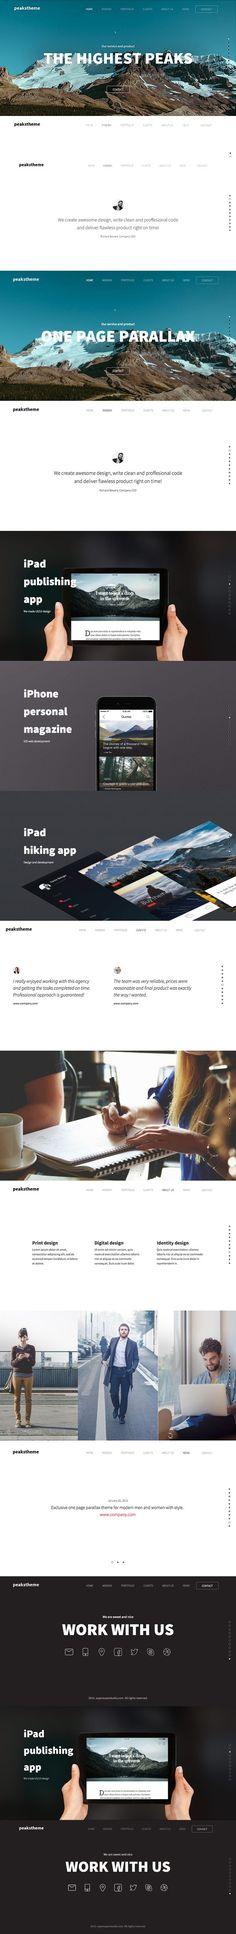 'Peaks' Digital Agency Template. HTML/CSS Themes. $29.00